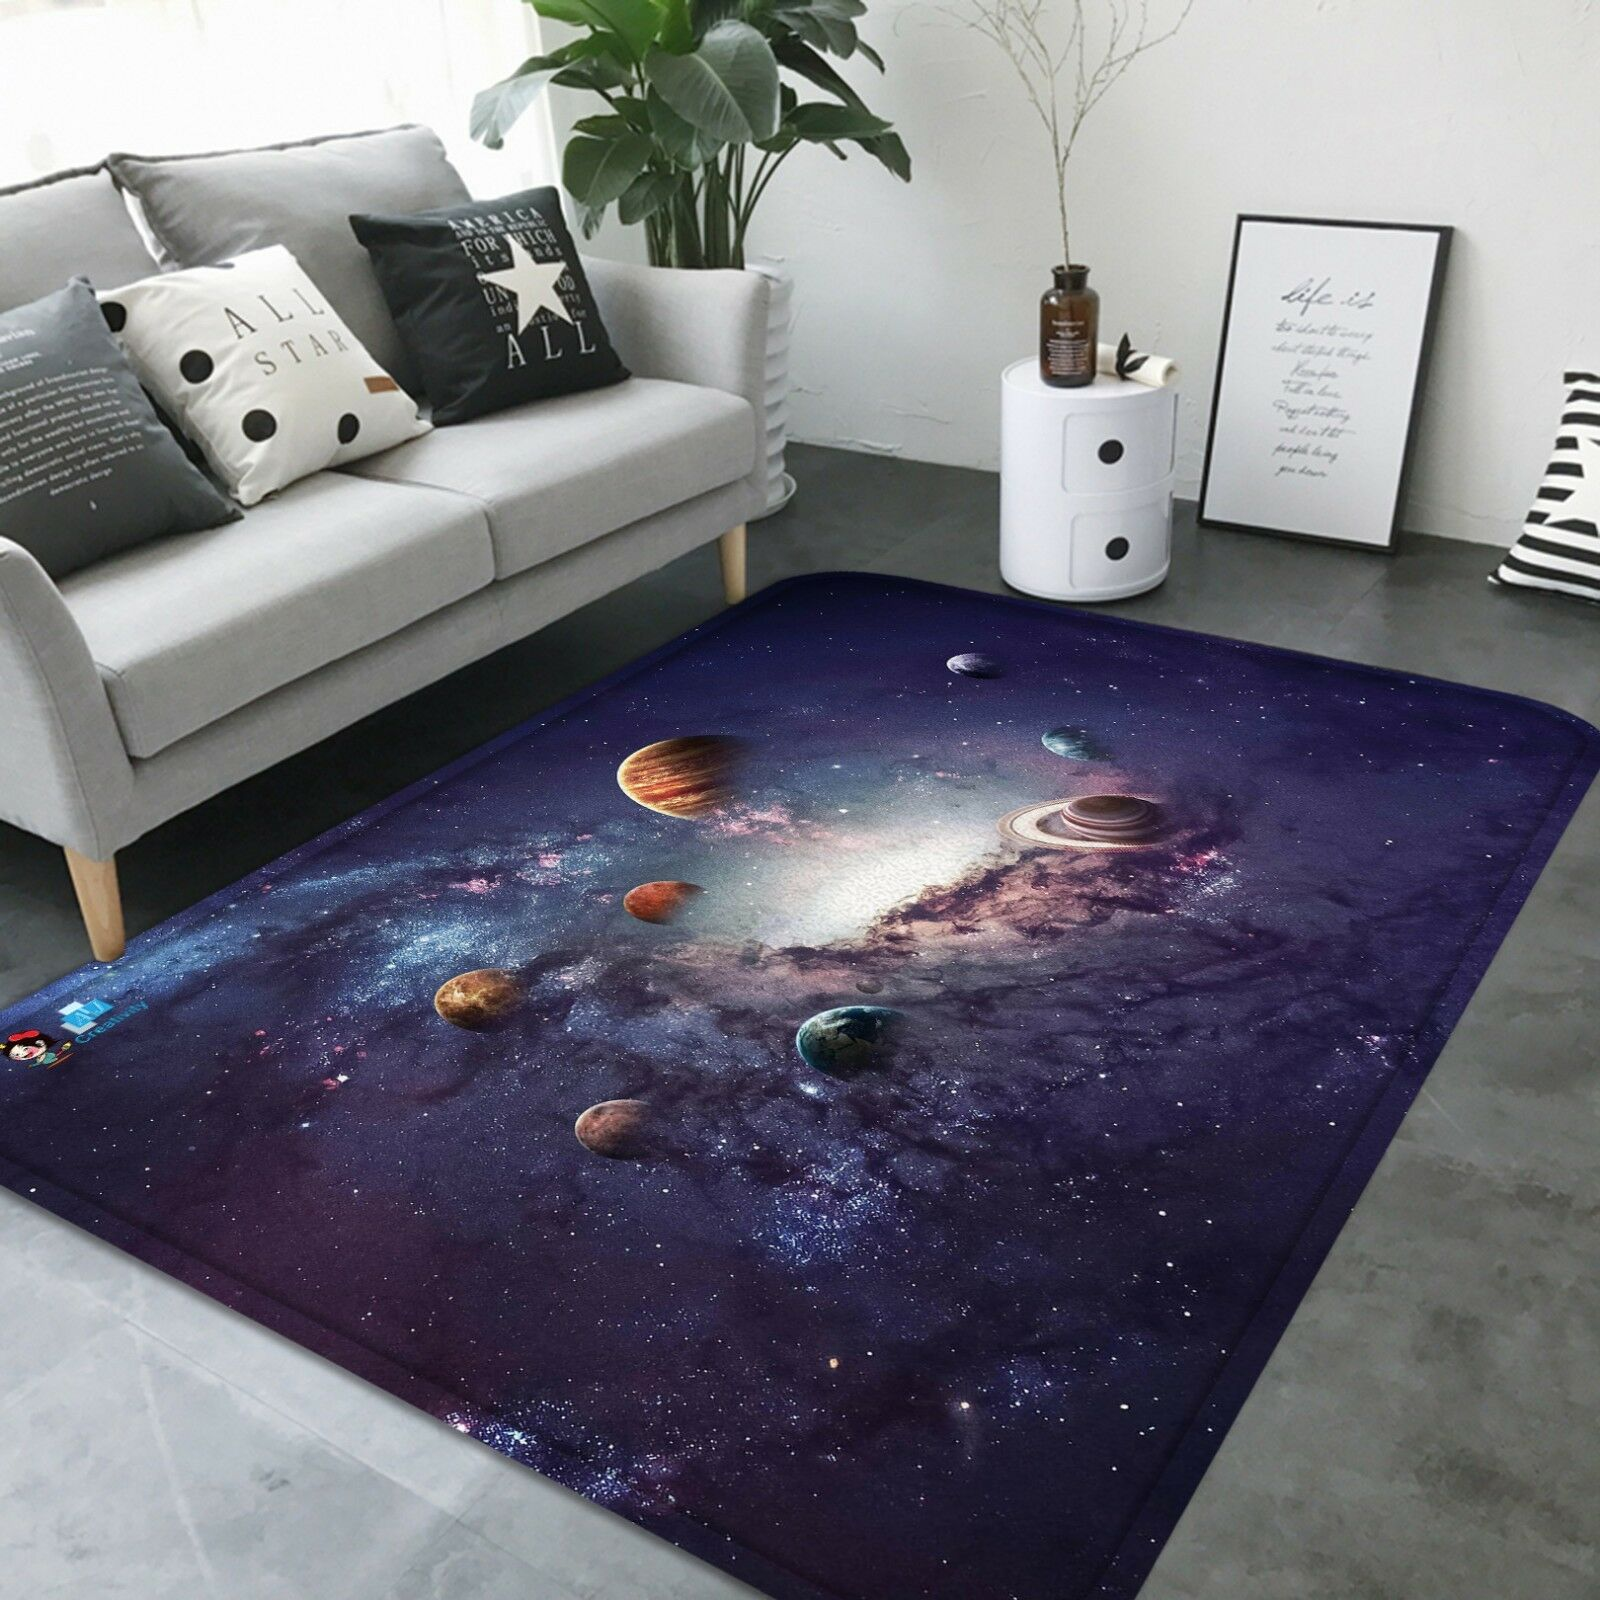 3D Planet 05 tappetino antiscivolo tappeto camera Tappetino Qualità Qualità Qualità Elegante foto Tappeto UK Estate 0189ee